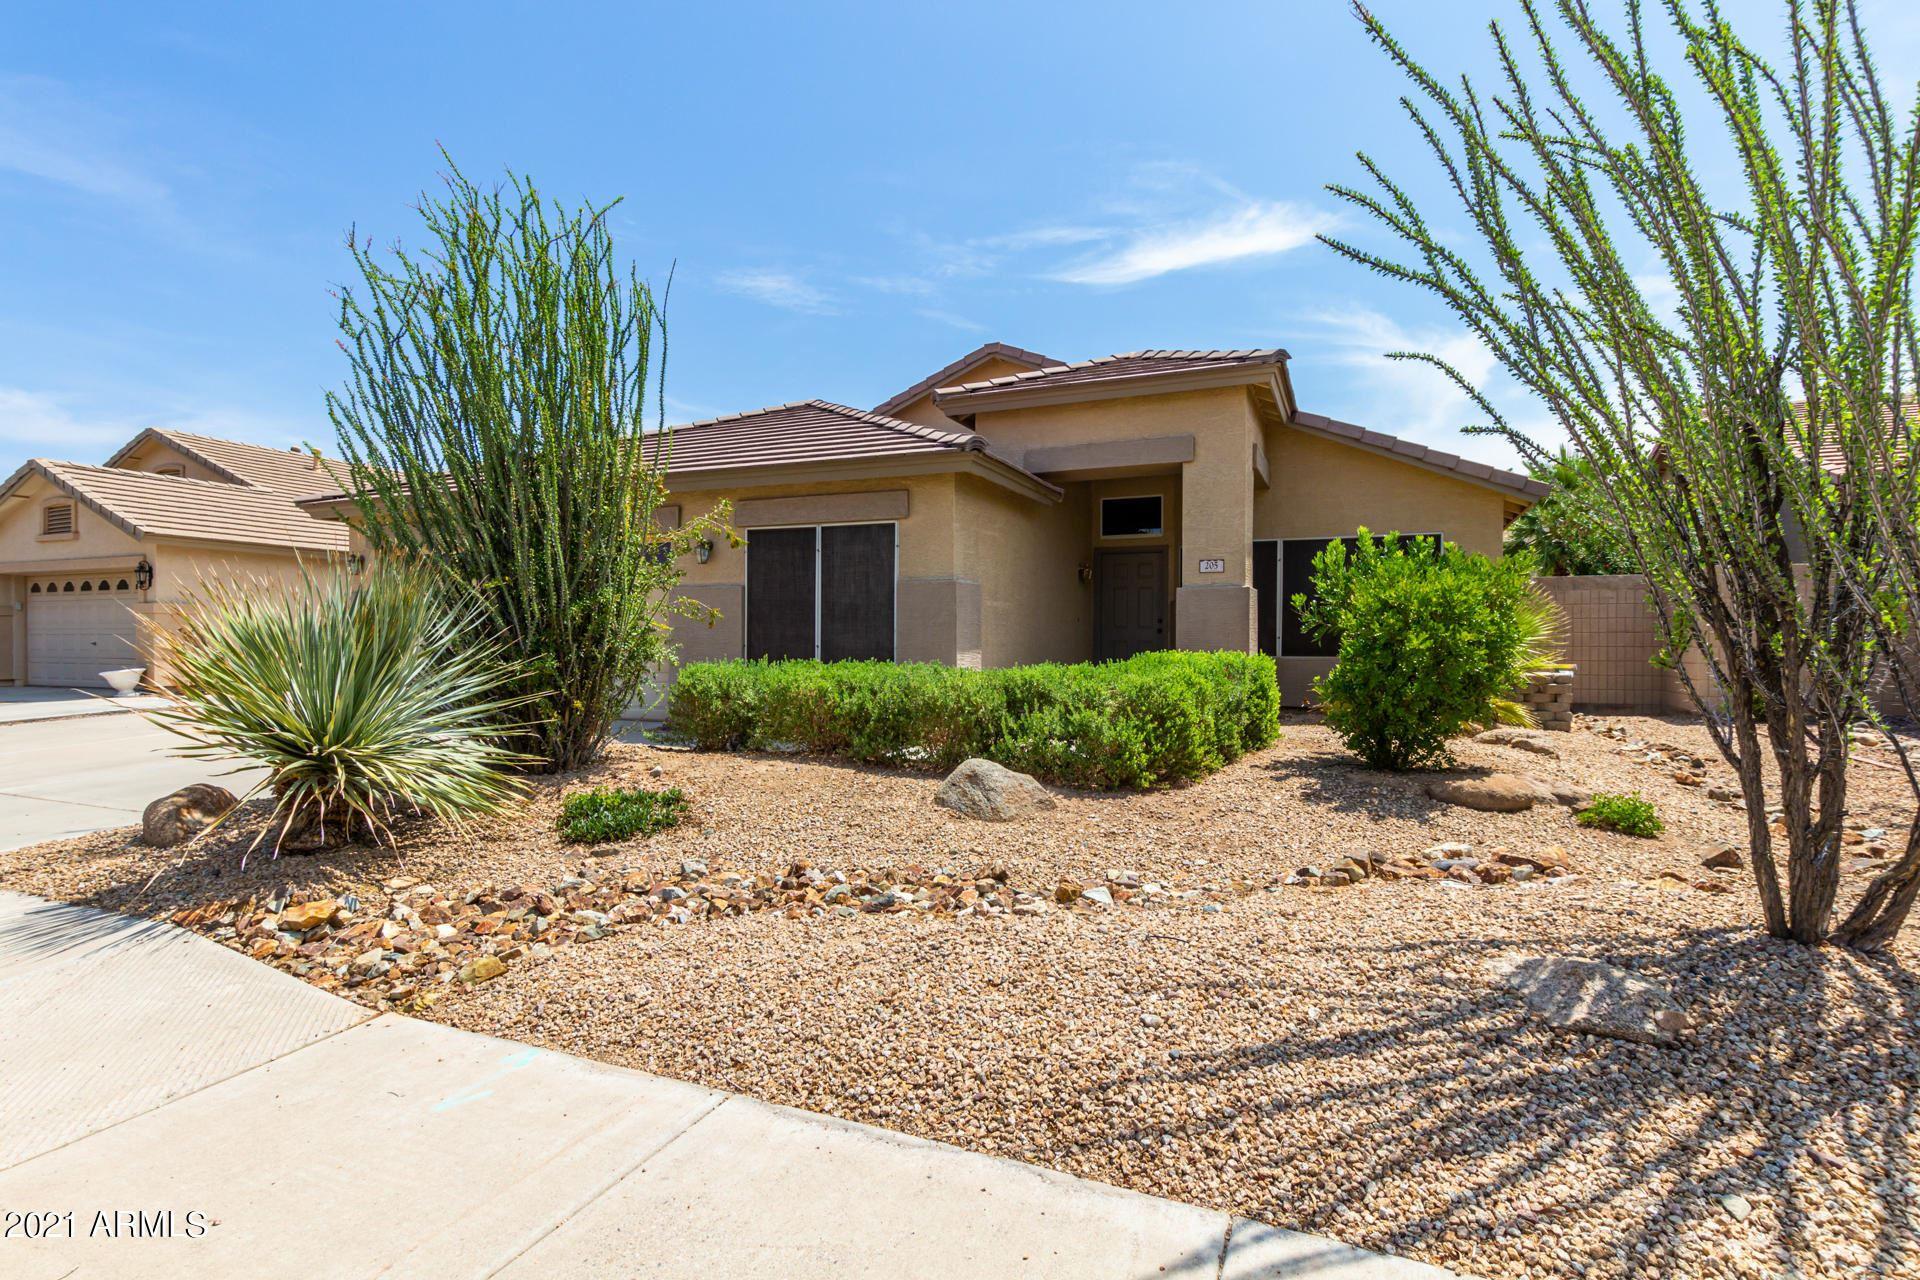 Photo of 205 S 122ND Drive, Avondale, AZ 85323 (MLS # 6267753)